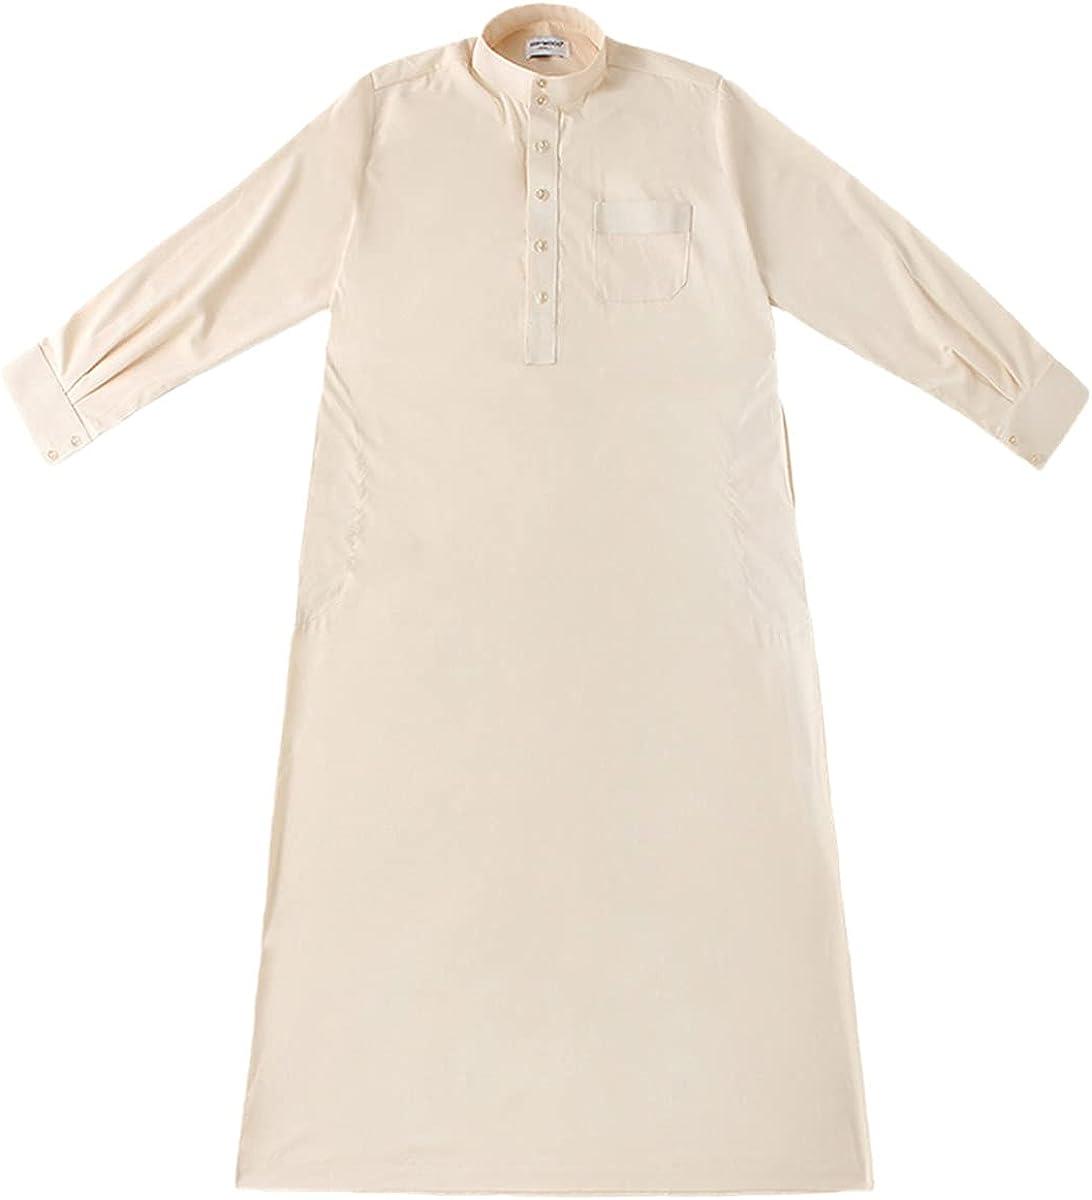 KEHAIOO Abaya Muslim Pakistan Islamic Dress Kaftan, Mens Arab Robe Saudi Arabia Jubba Thobe